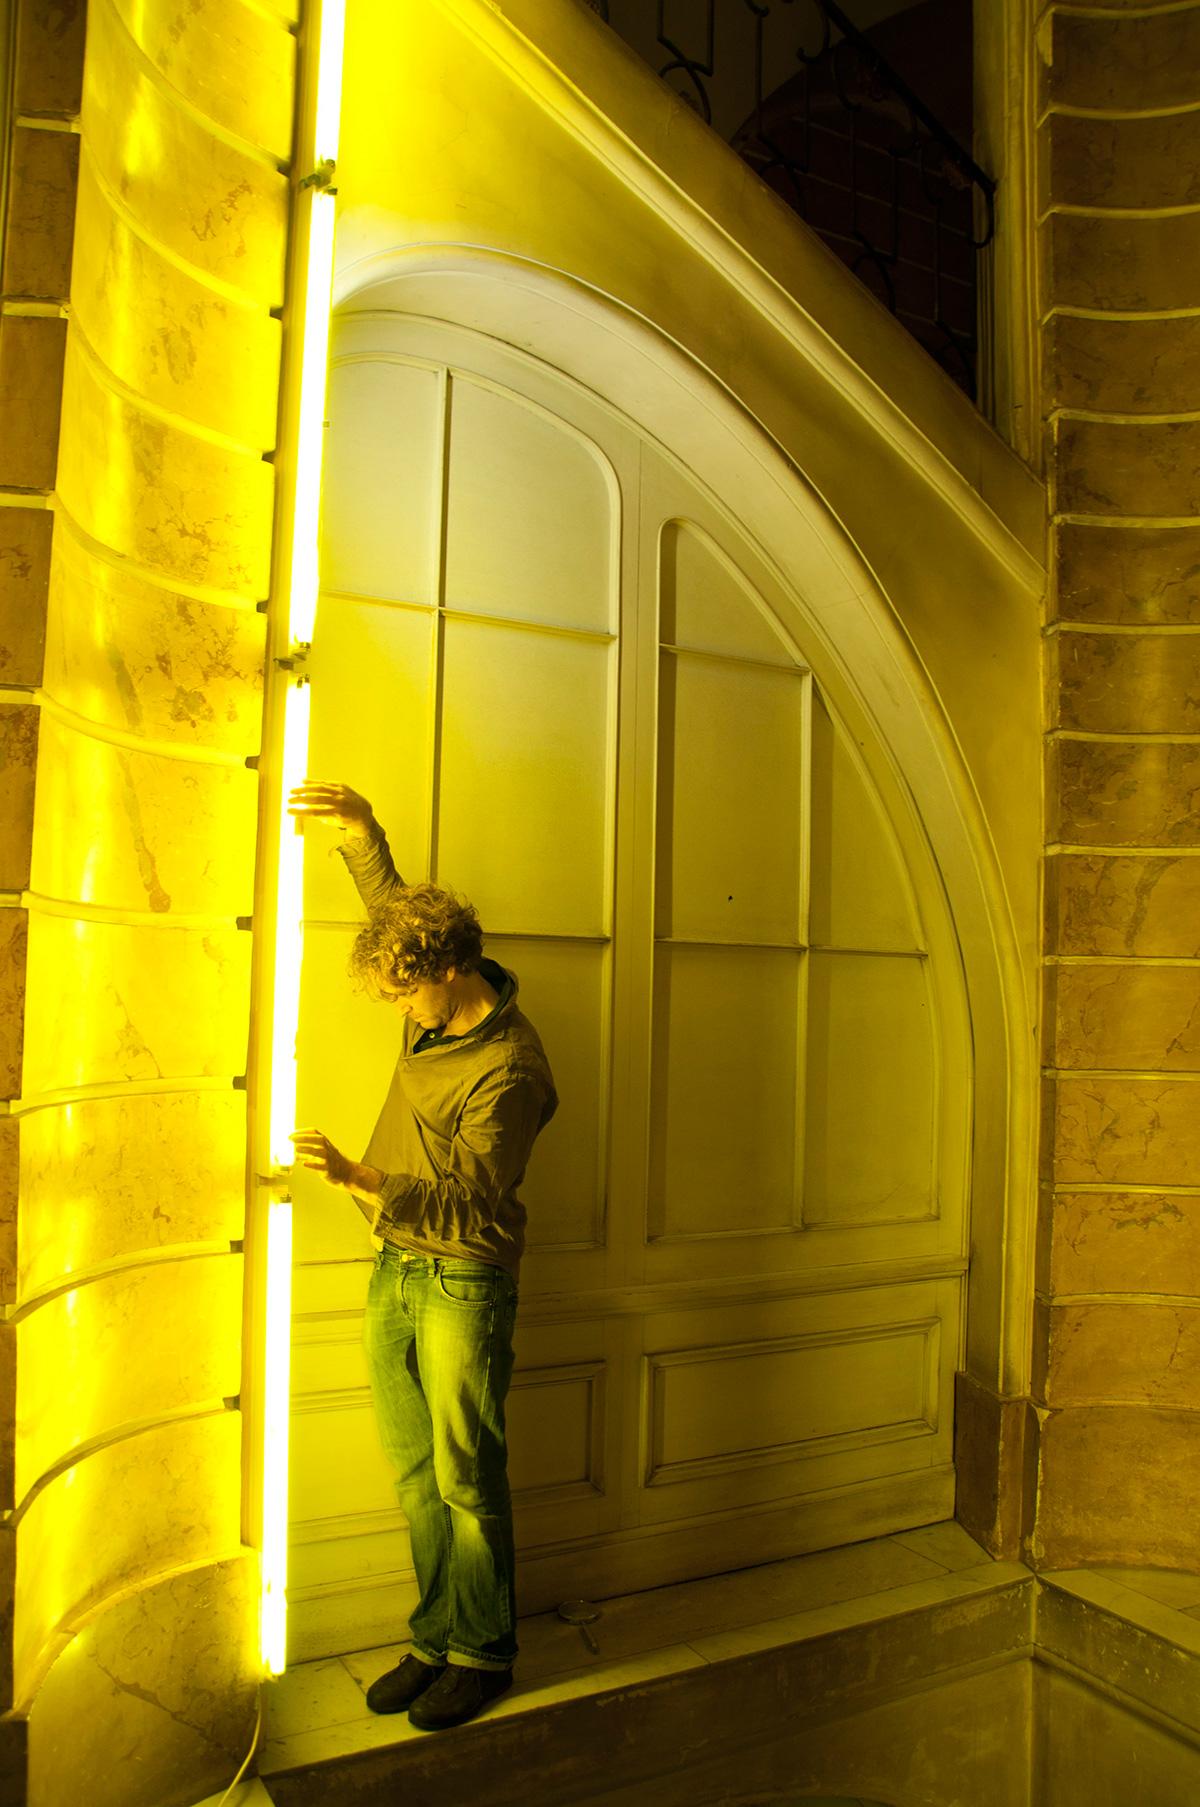 Prototypenbau Lichtinstallation Treppenhaus Neues Palais